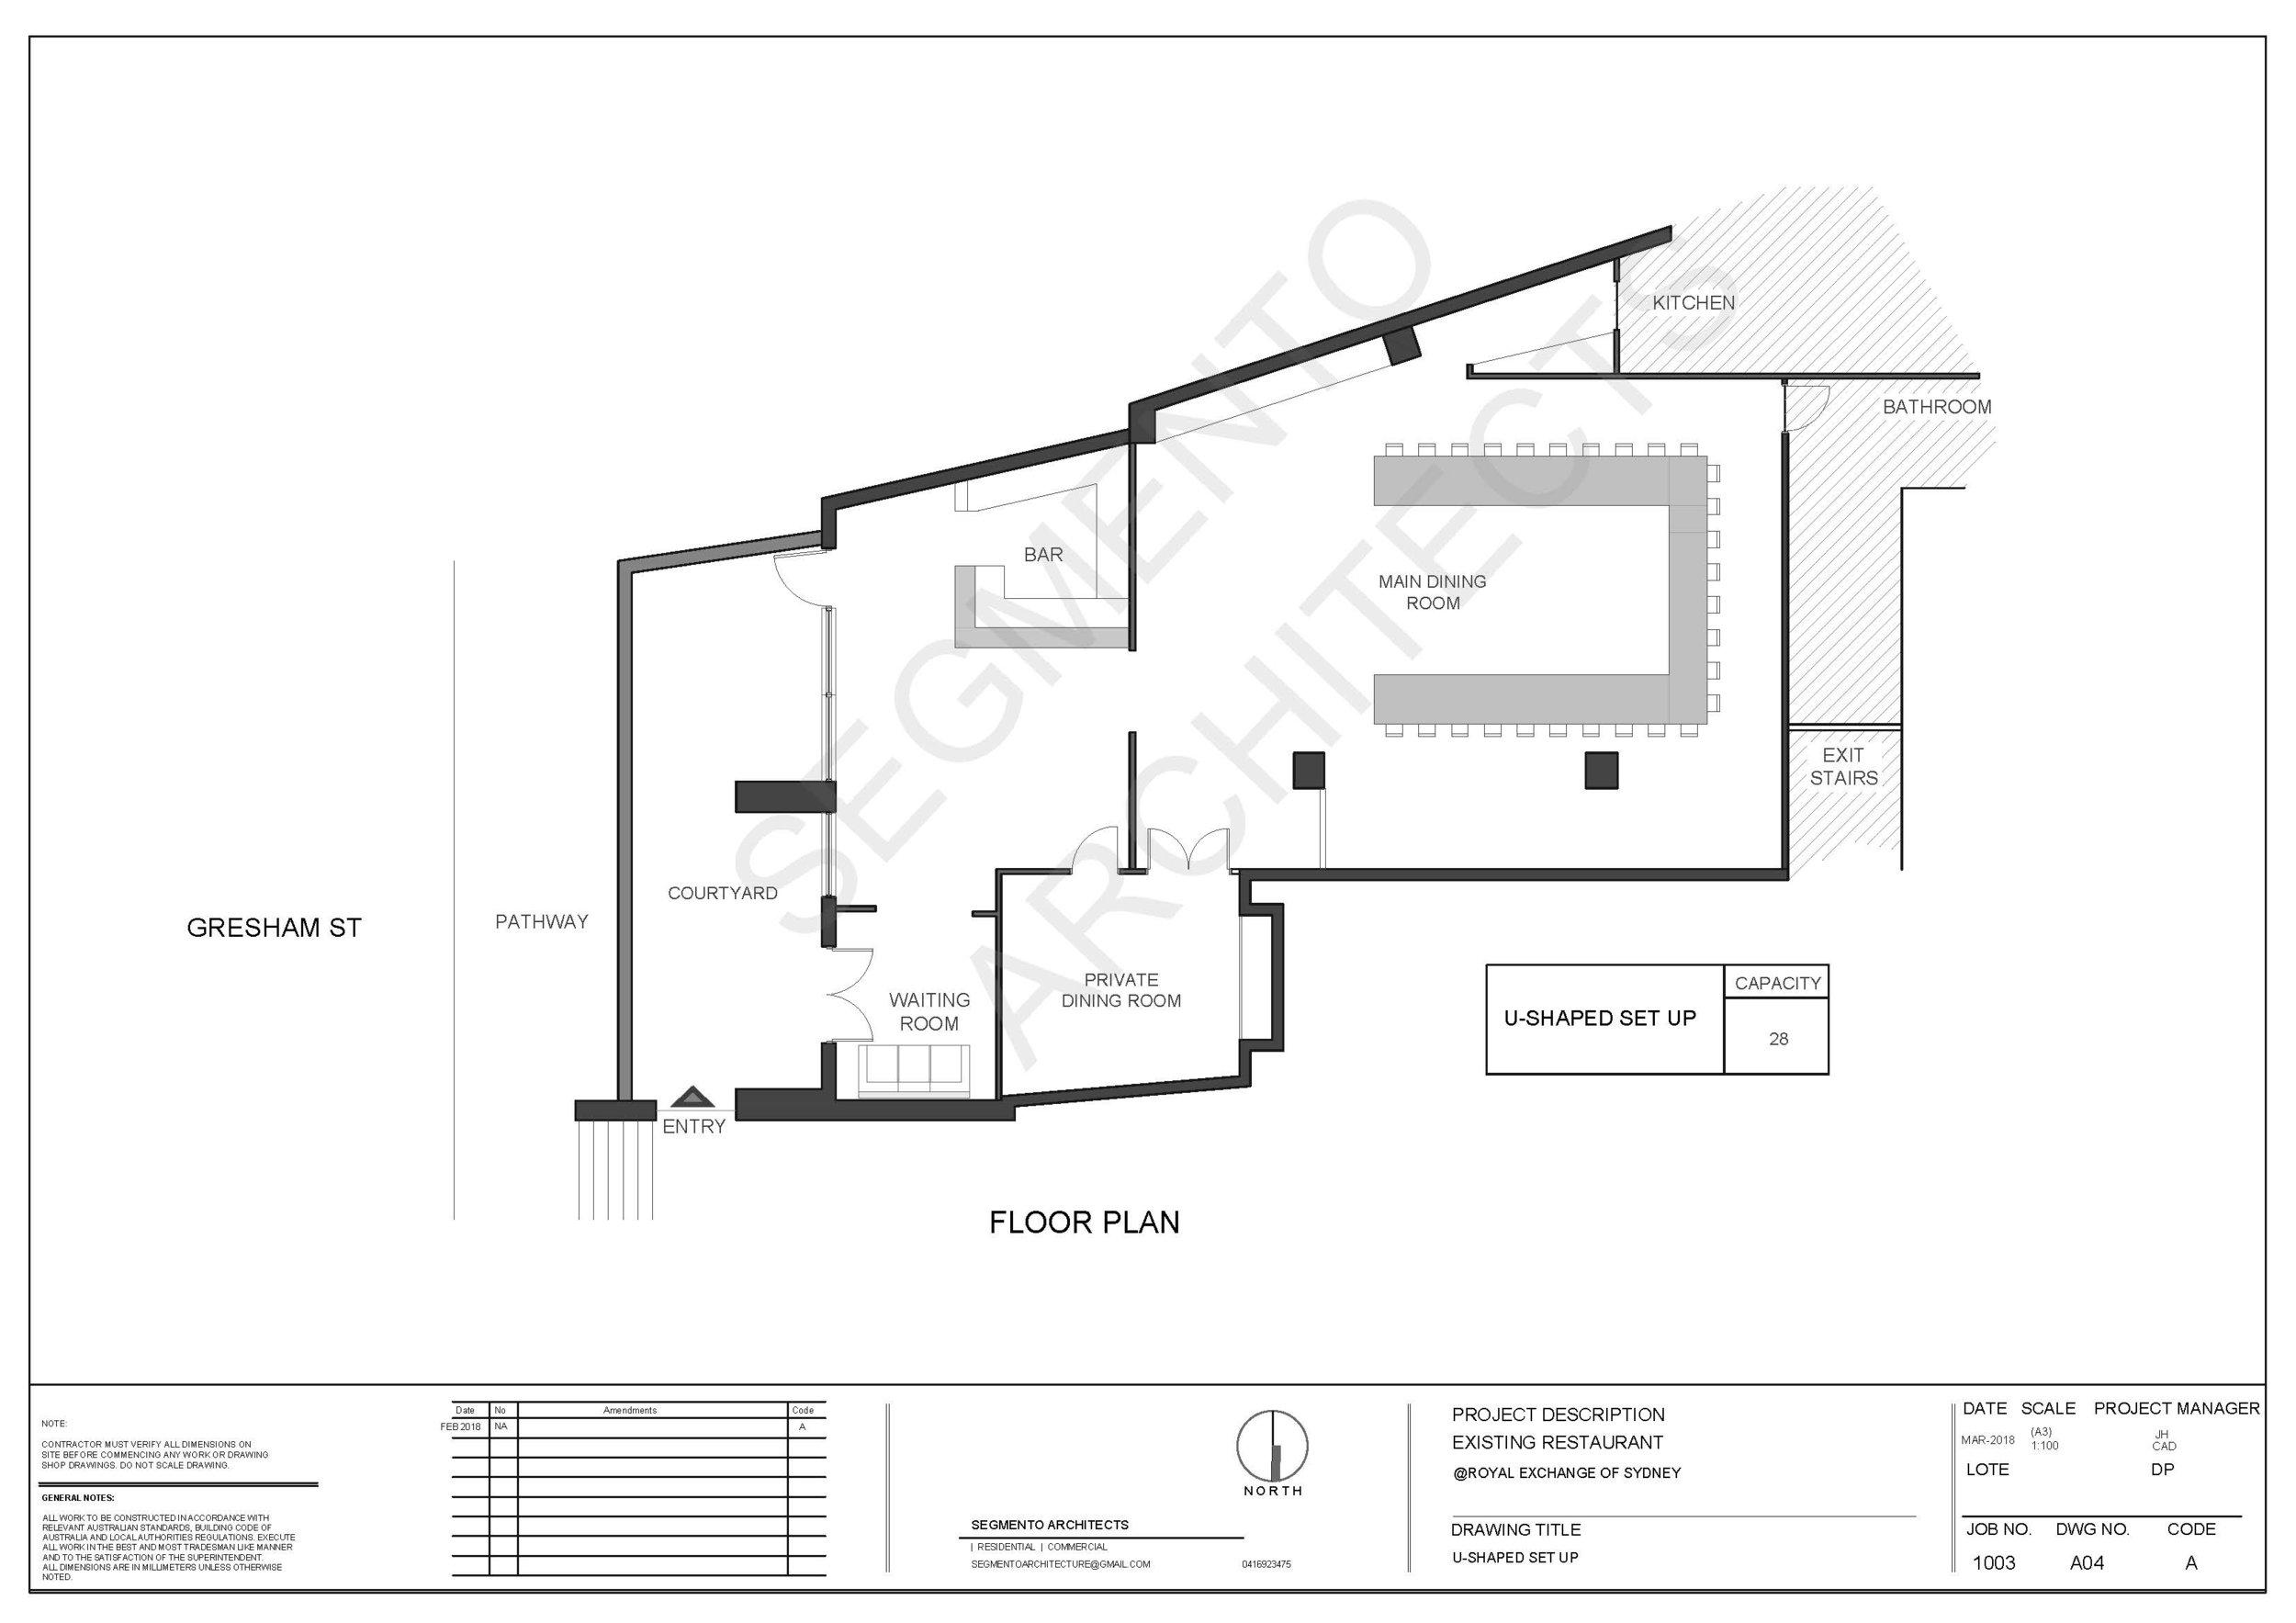 ROYAL EXCHANGE_Floorplans Combined_Page_6.jpg